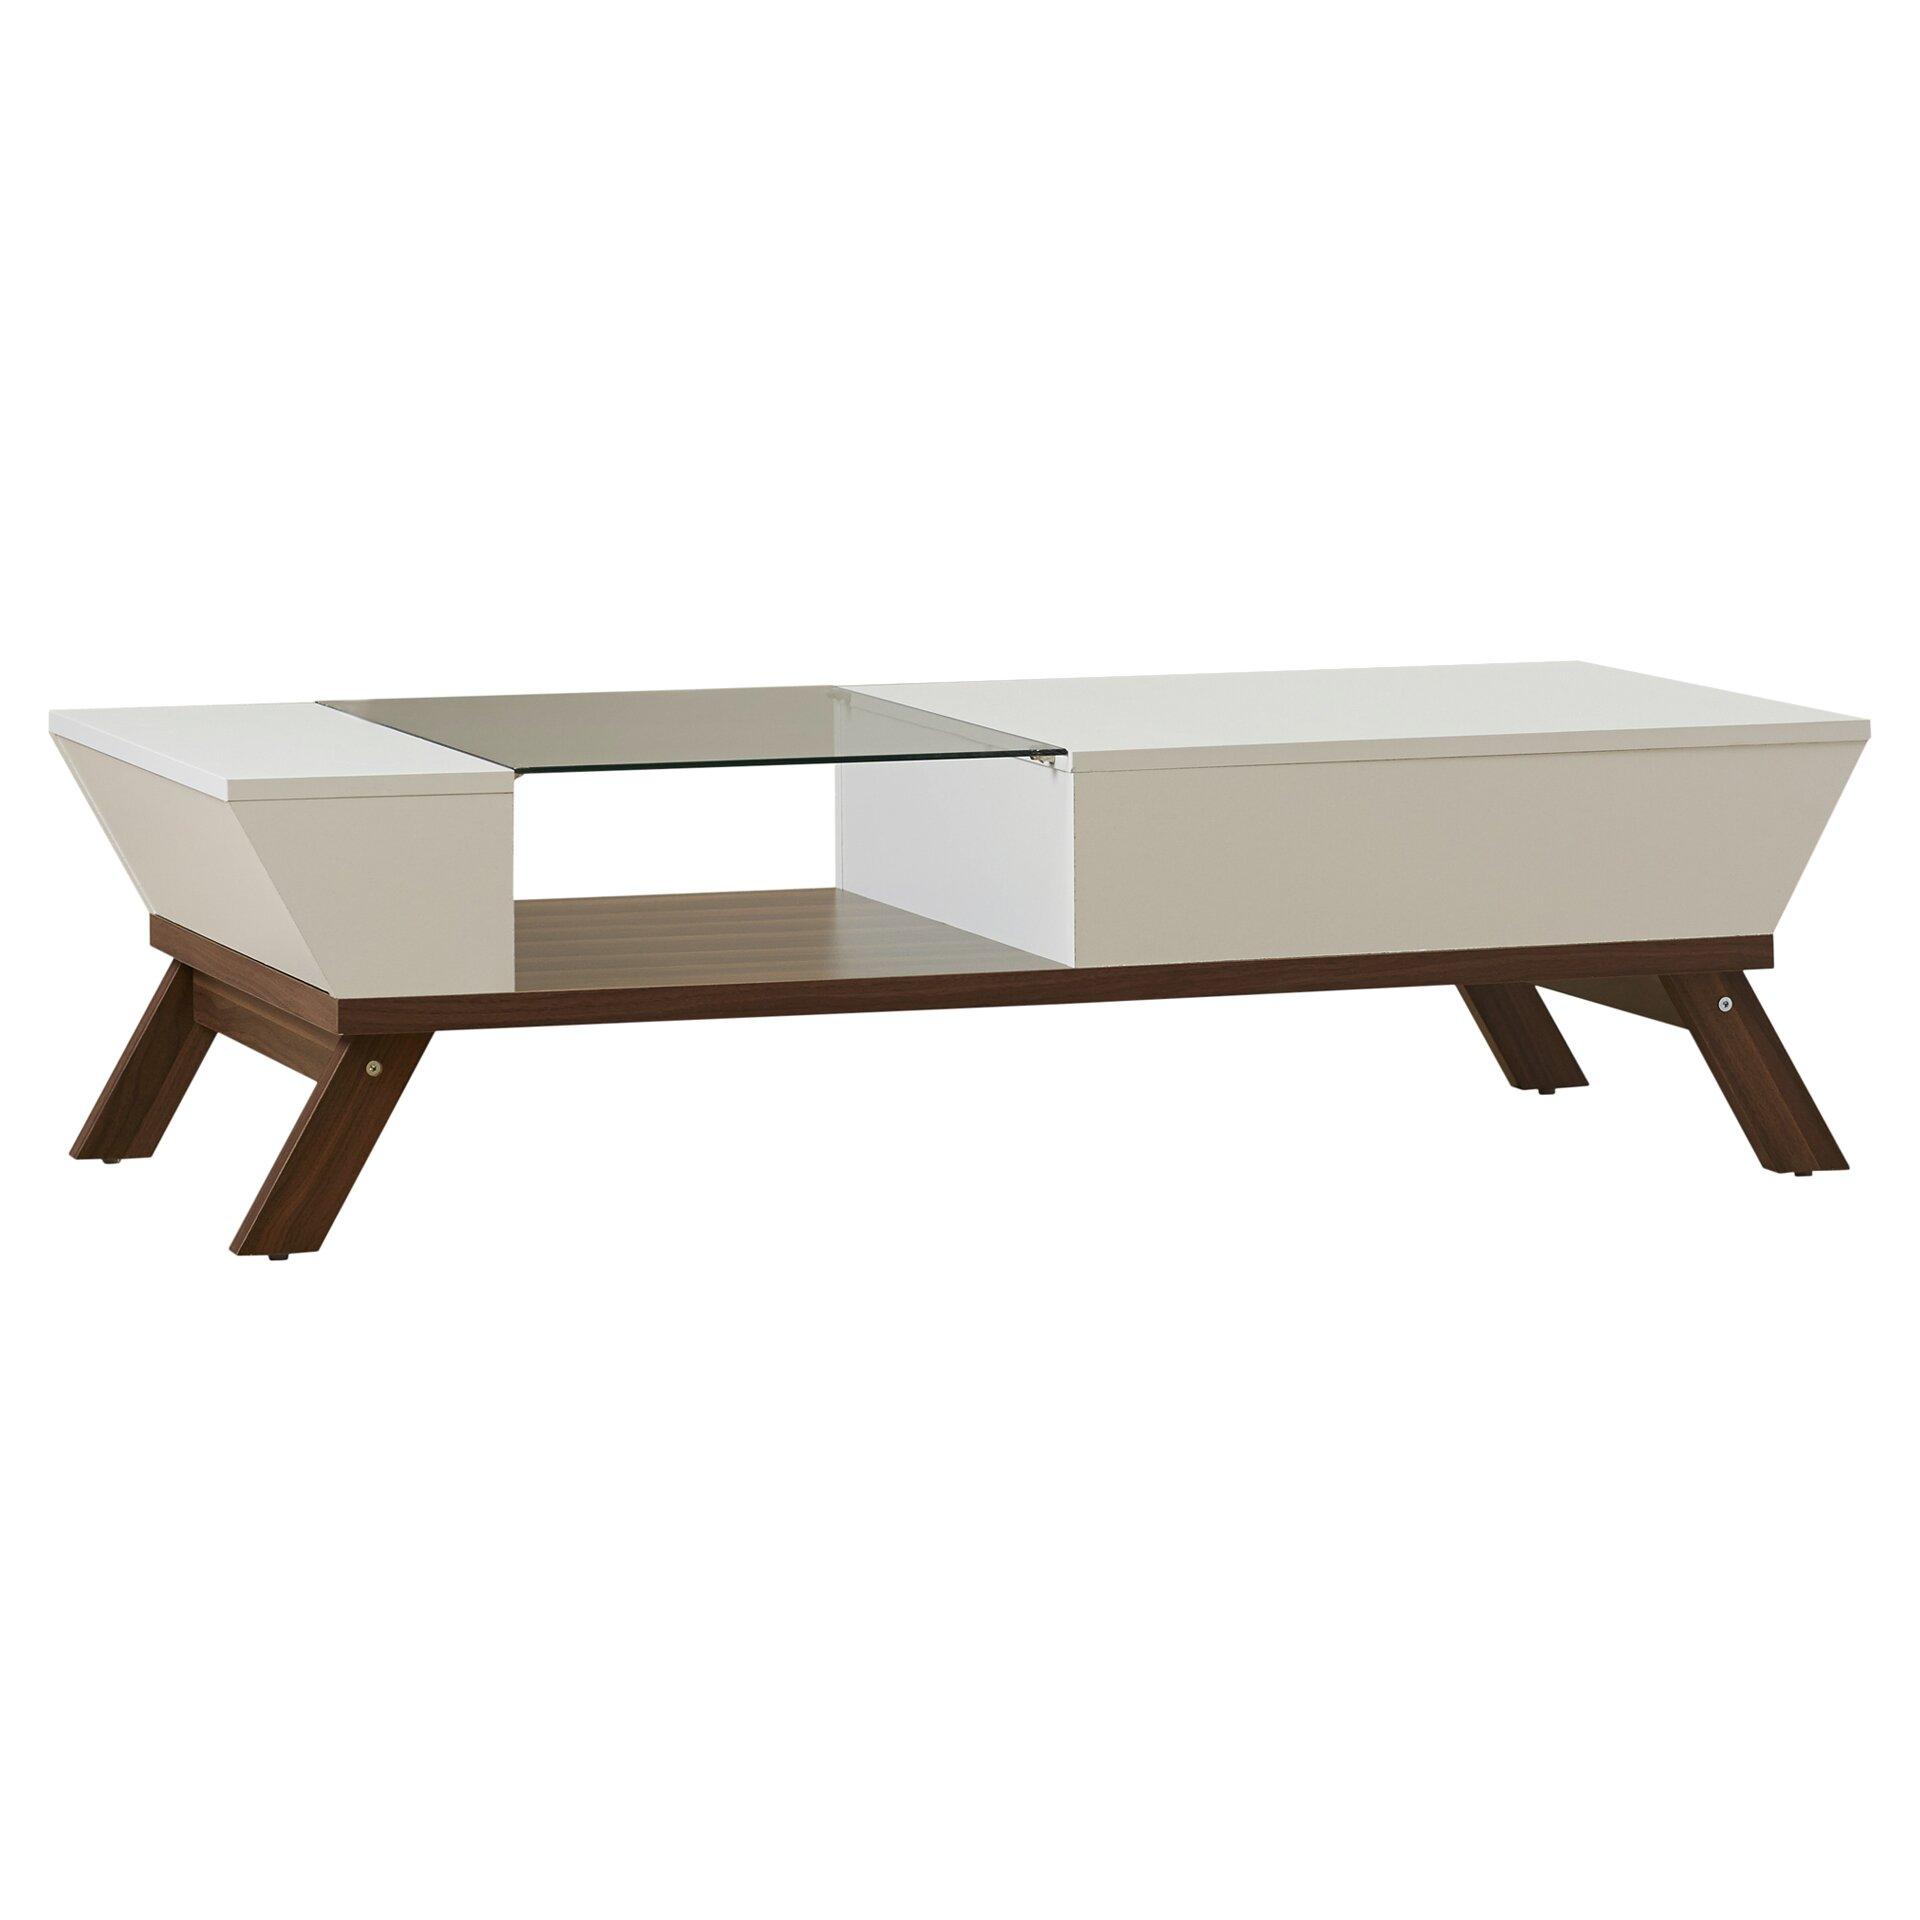 Mercury row coffee table reviews wayfairca for Wayfair coffee tables with storage